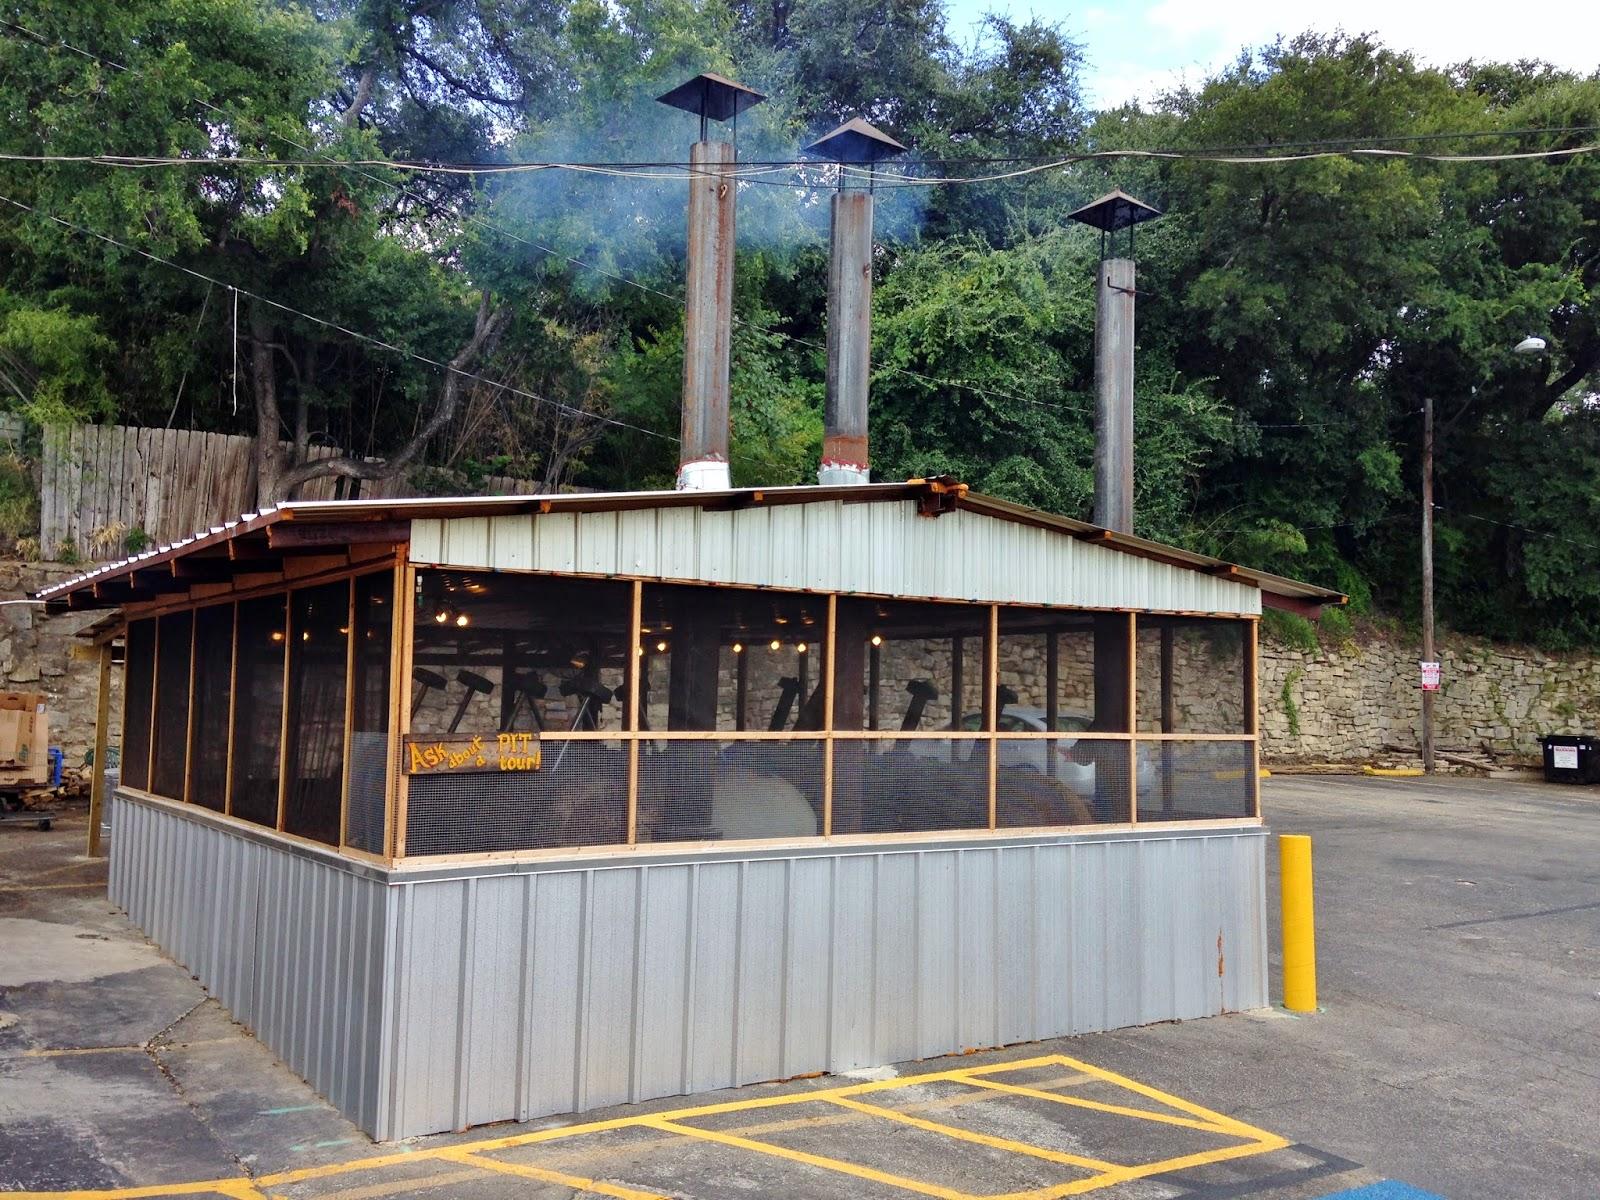 Terry Black's detached smokehouse